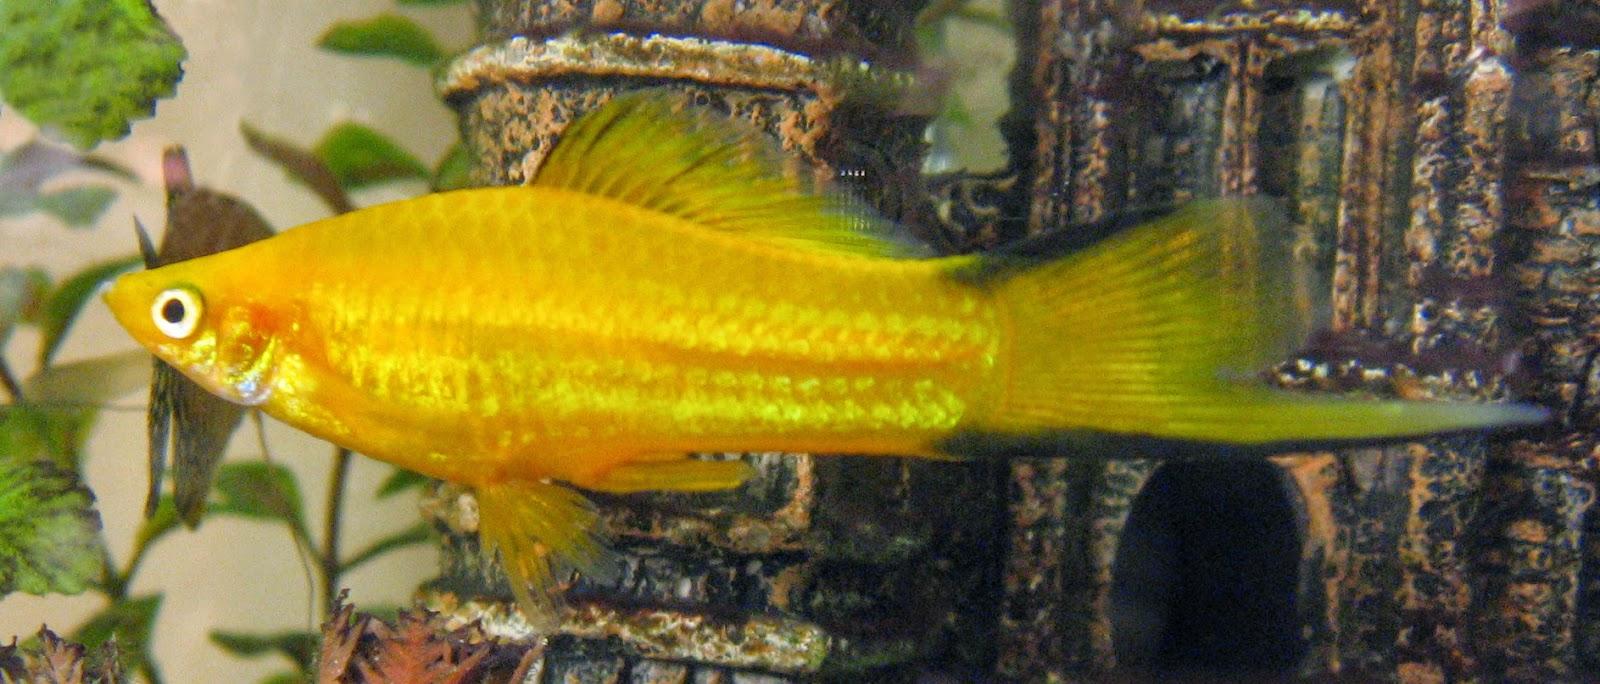 Freshwater Frenzy Swordtail Fact Sheet